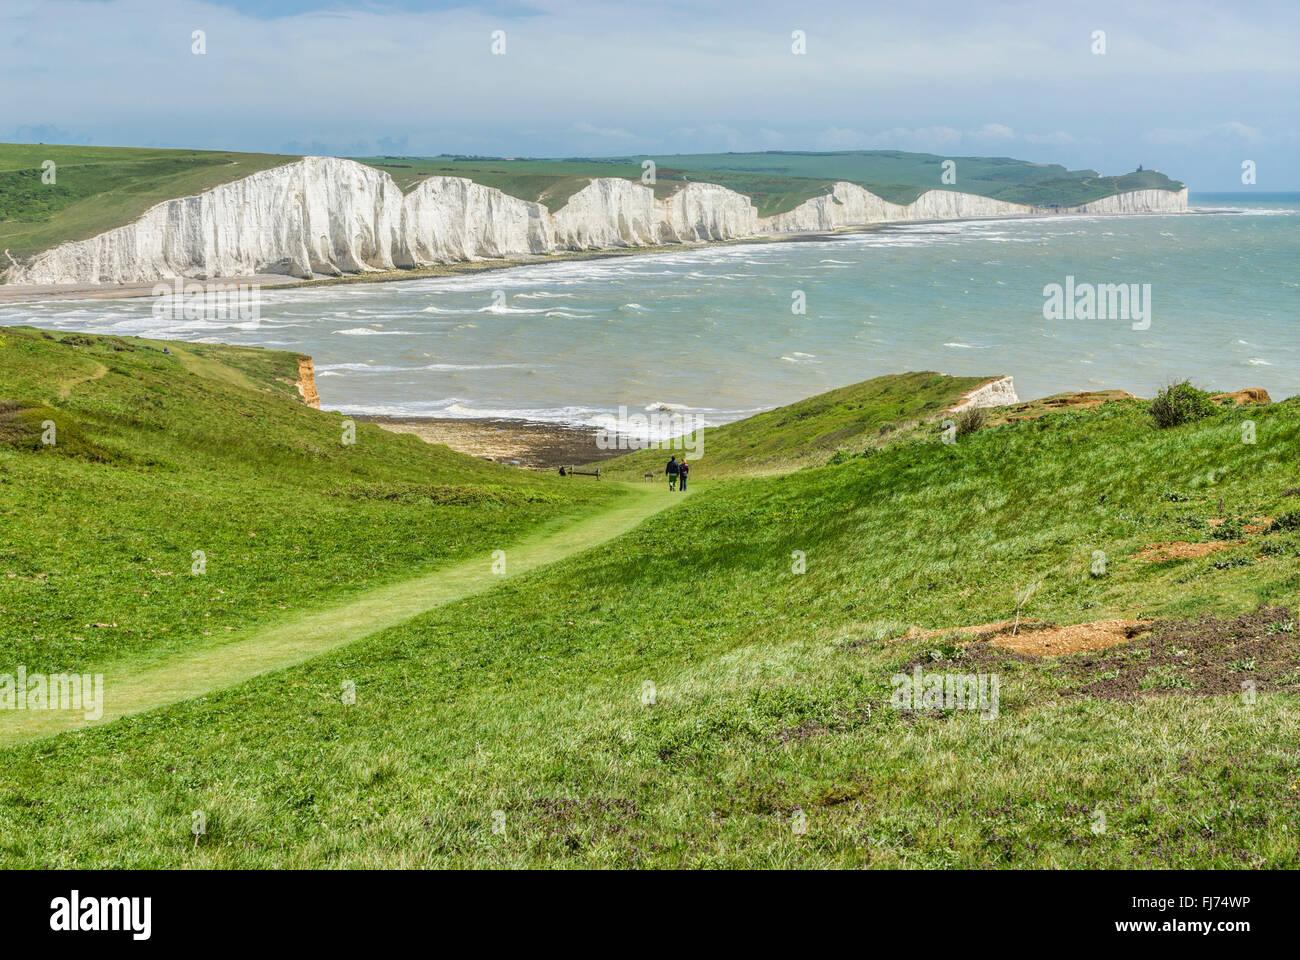 Siete Hermanas Formación acantilado cerca de Eastbourne, East Sussex, al sur de Inglaterra | Siete Hermanas, Imagen De Stock